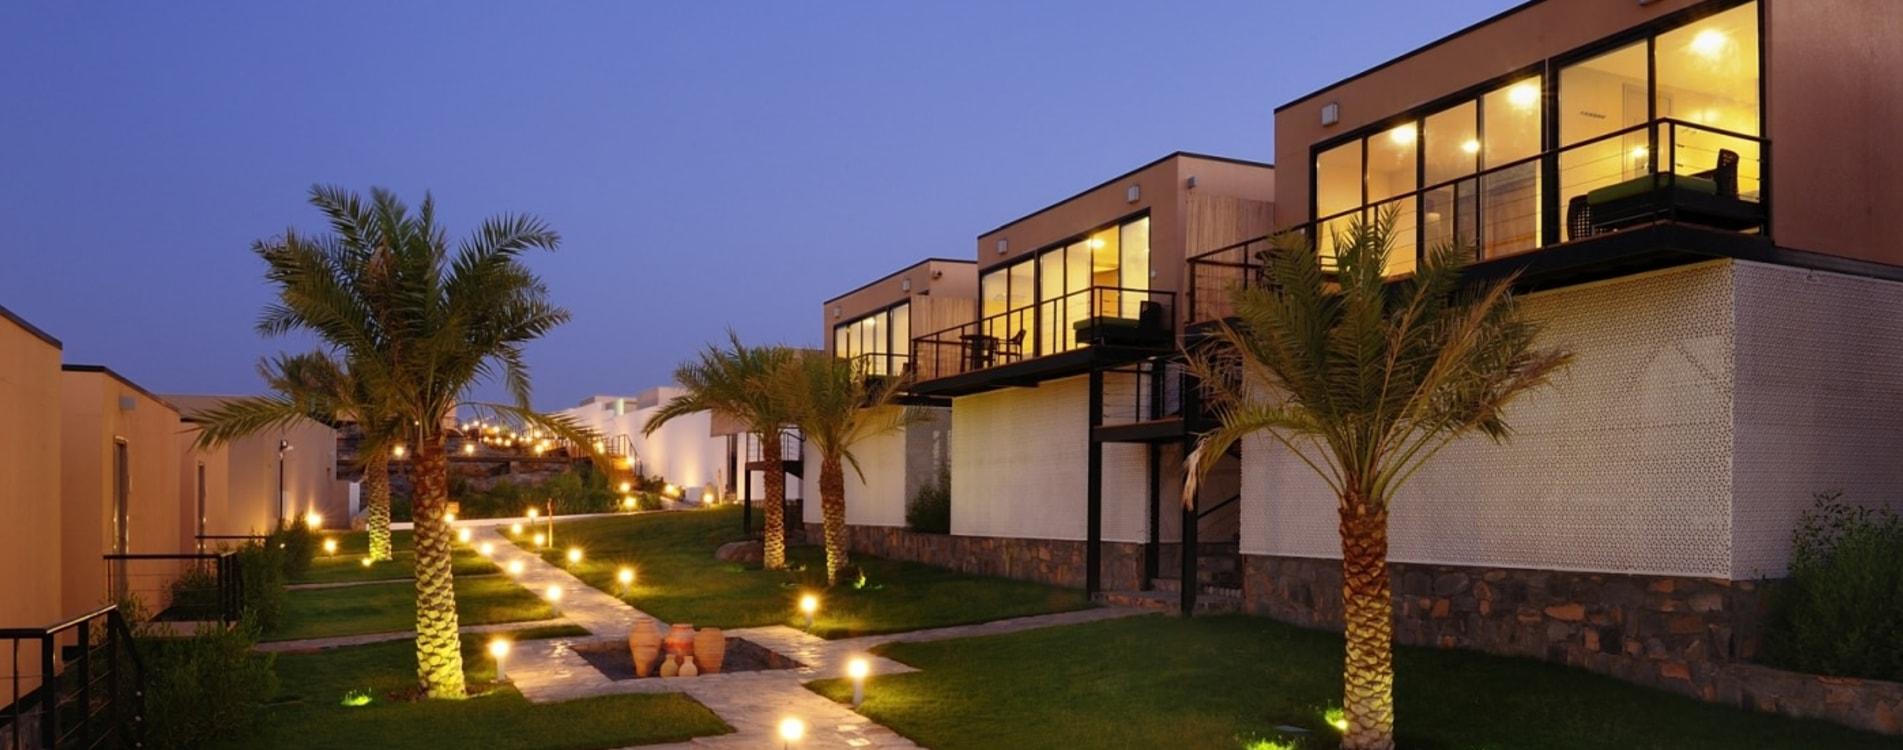 The-View-Unterkünfte-Dämmerung-Oman.jpg